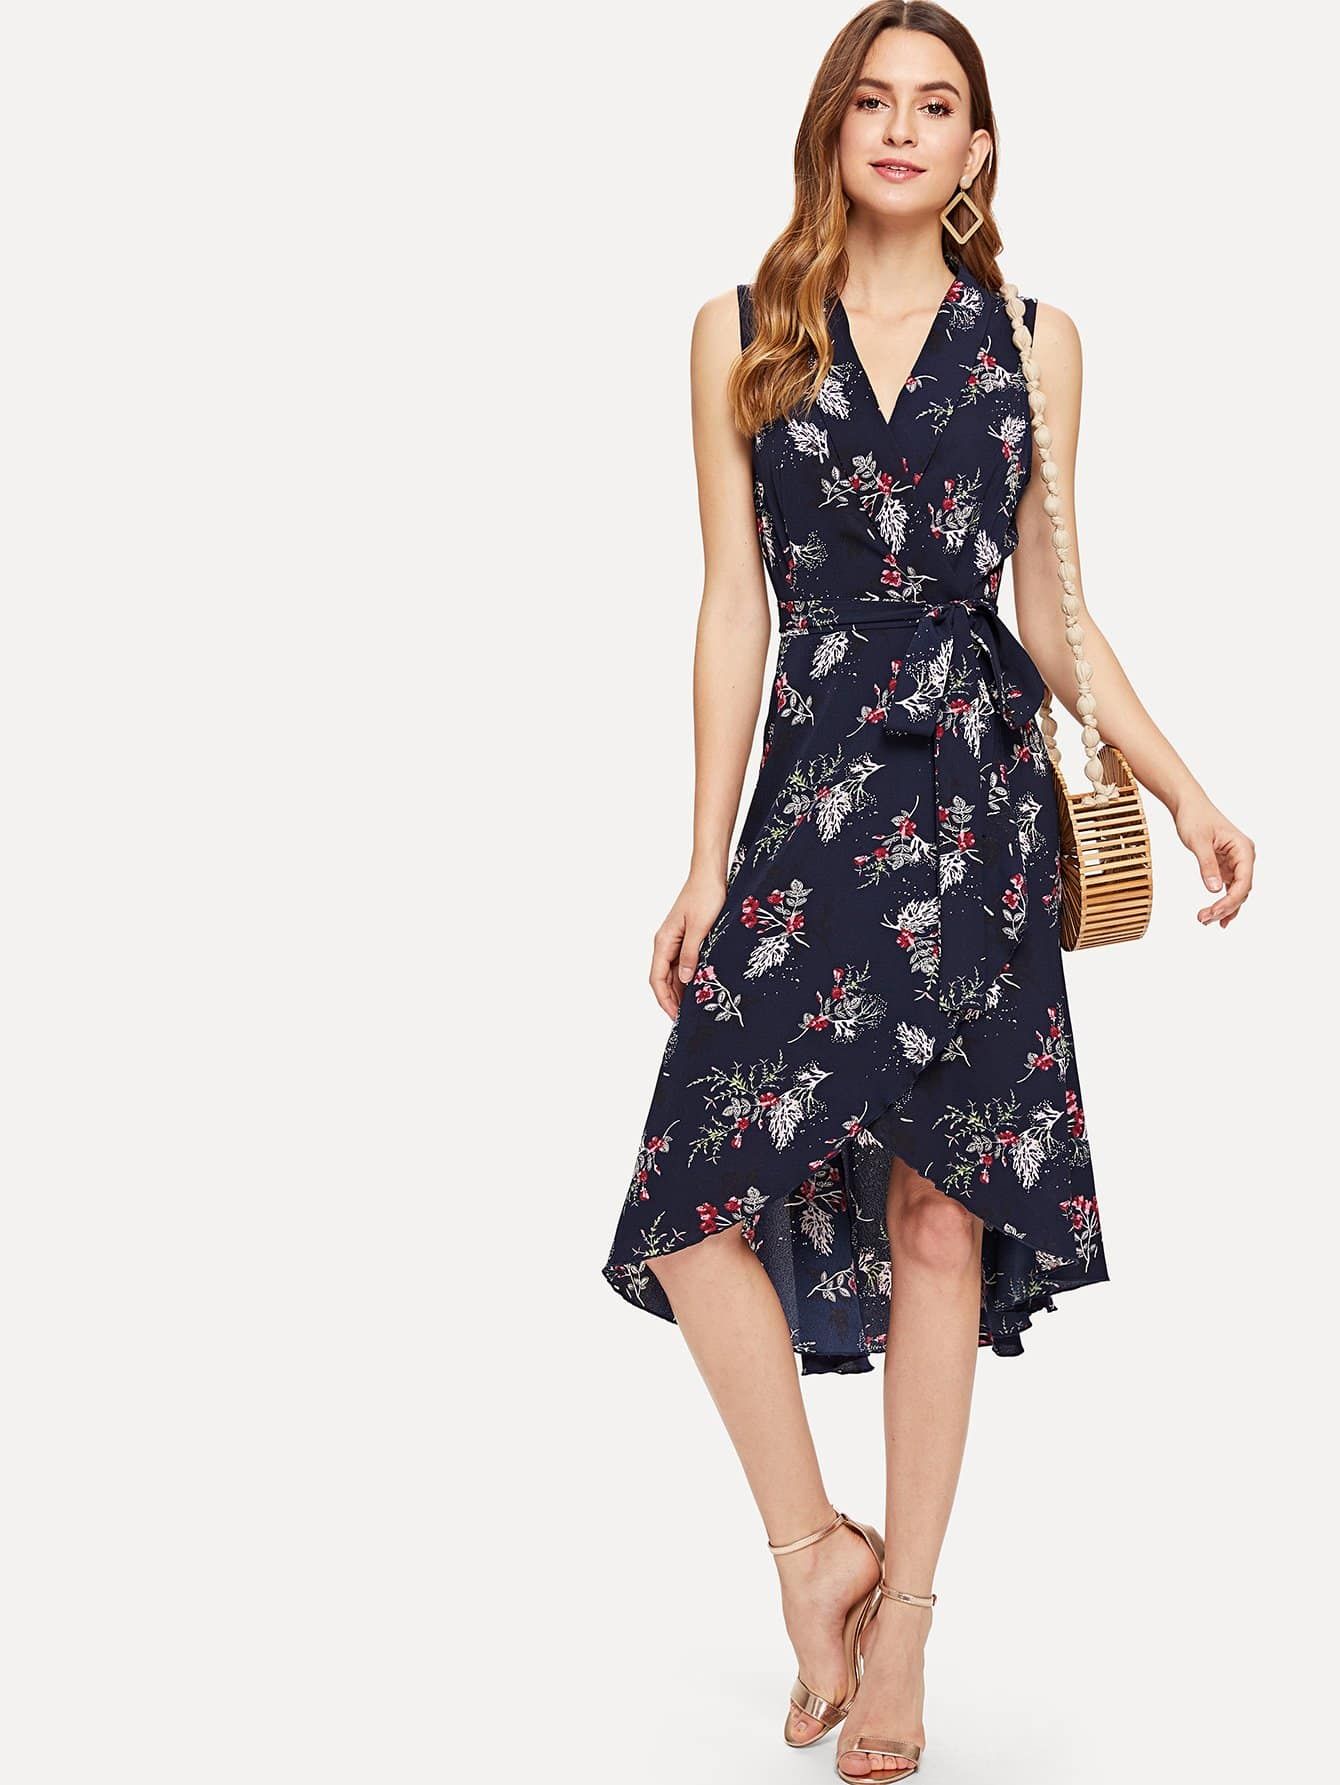 Botanical Print High Low Wrap Dress emoji print high low night dress